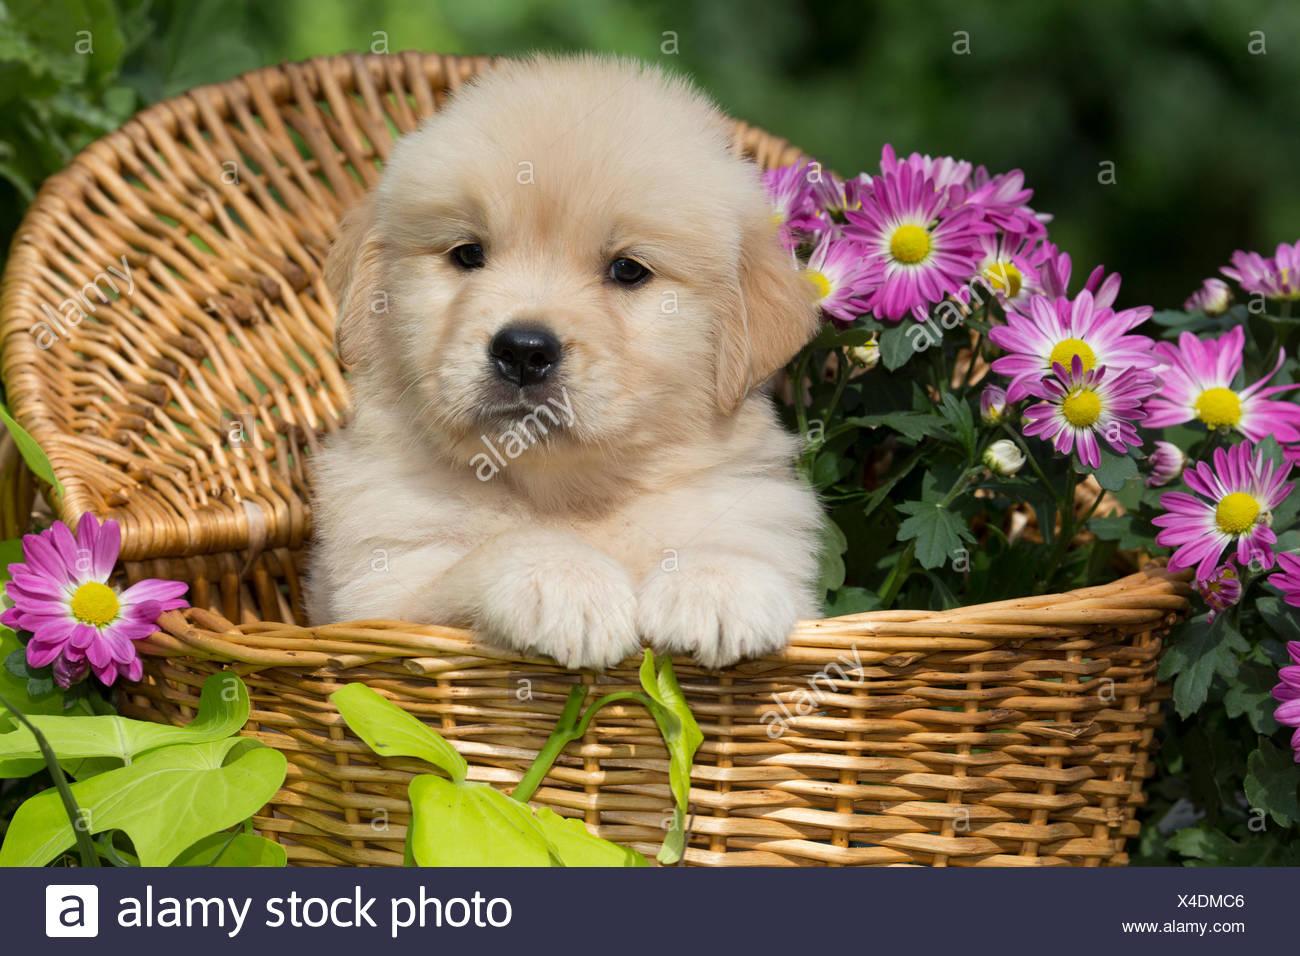 Golden Retriever Puppy In Wooden Basket With Purple Flowers Usa